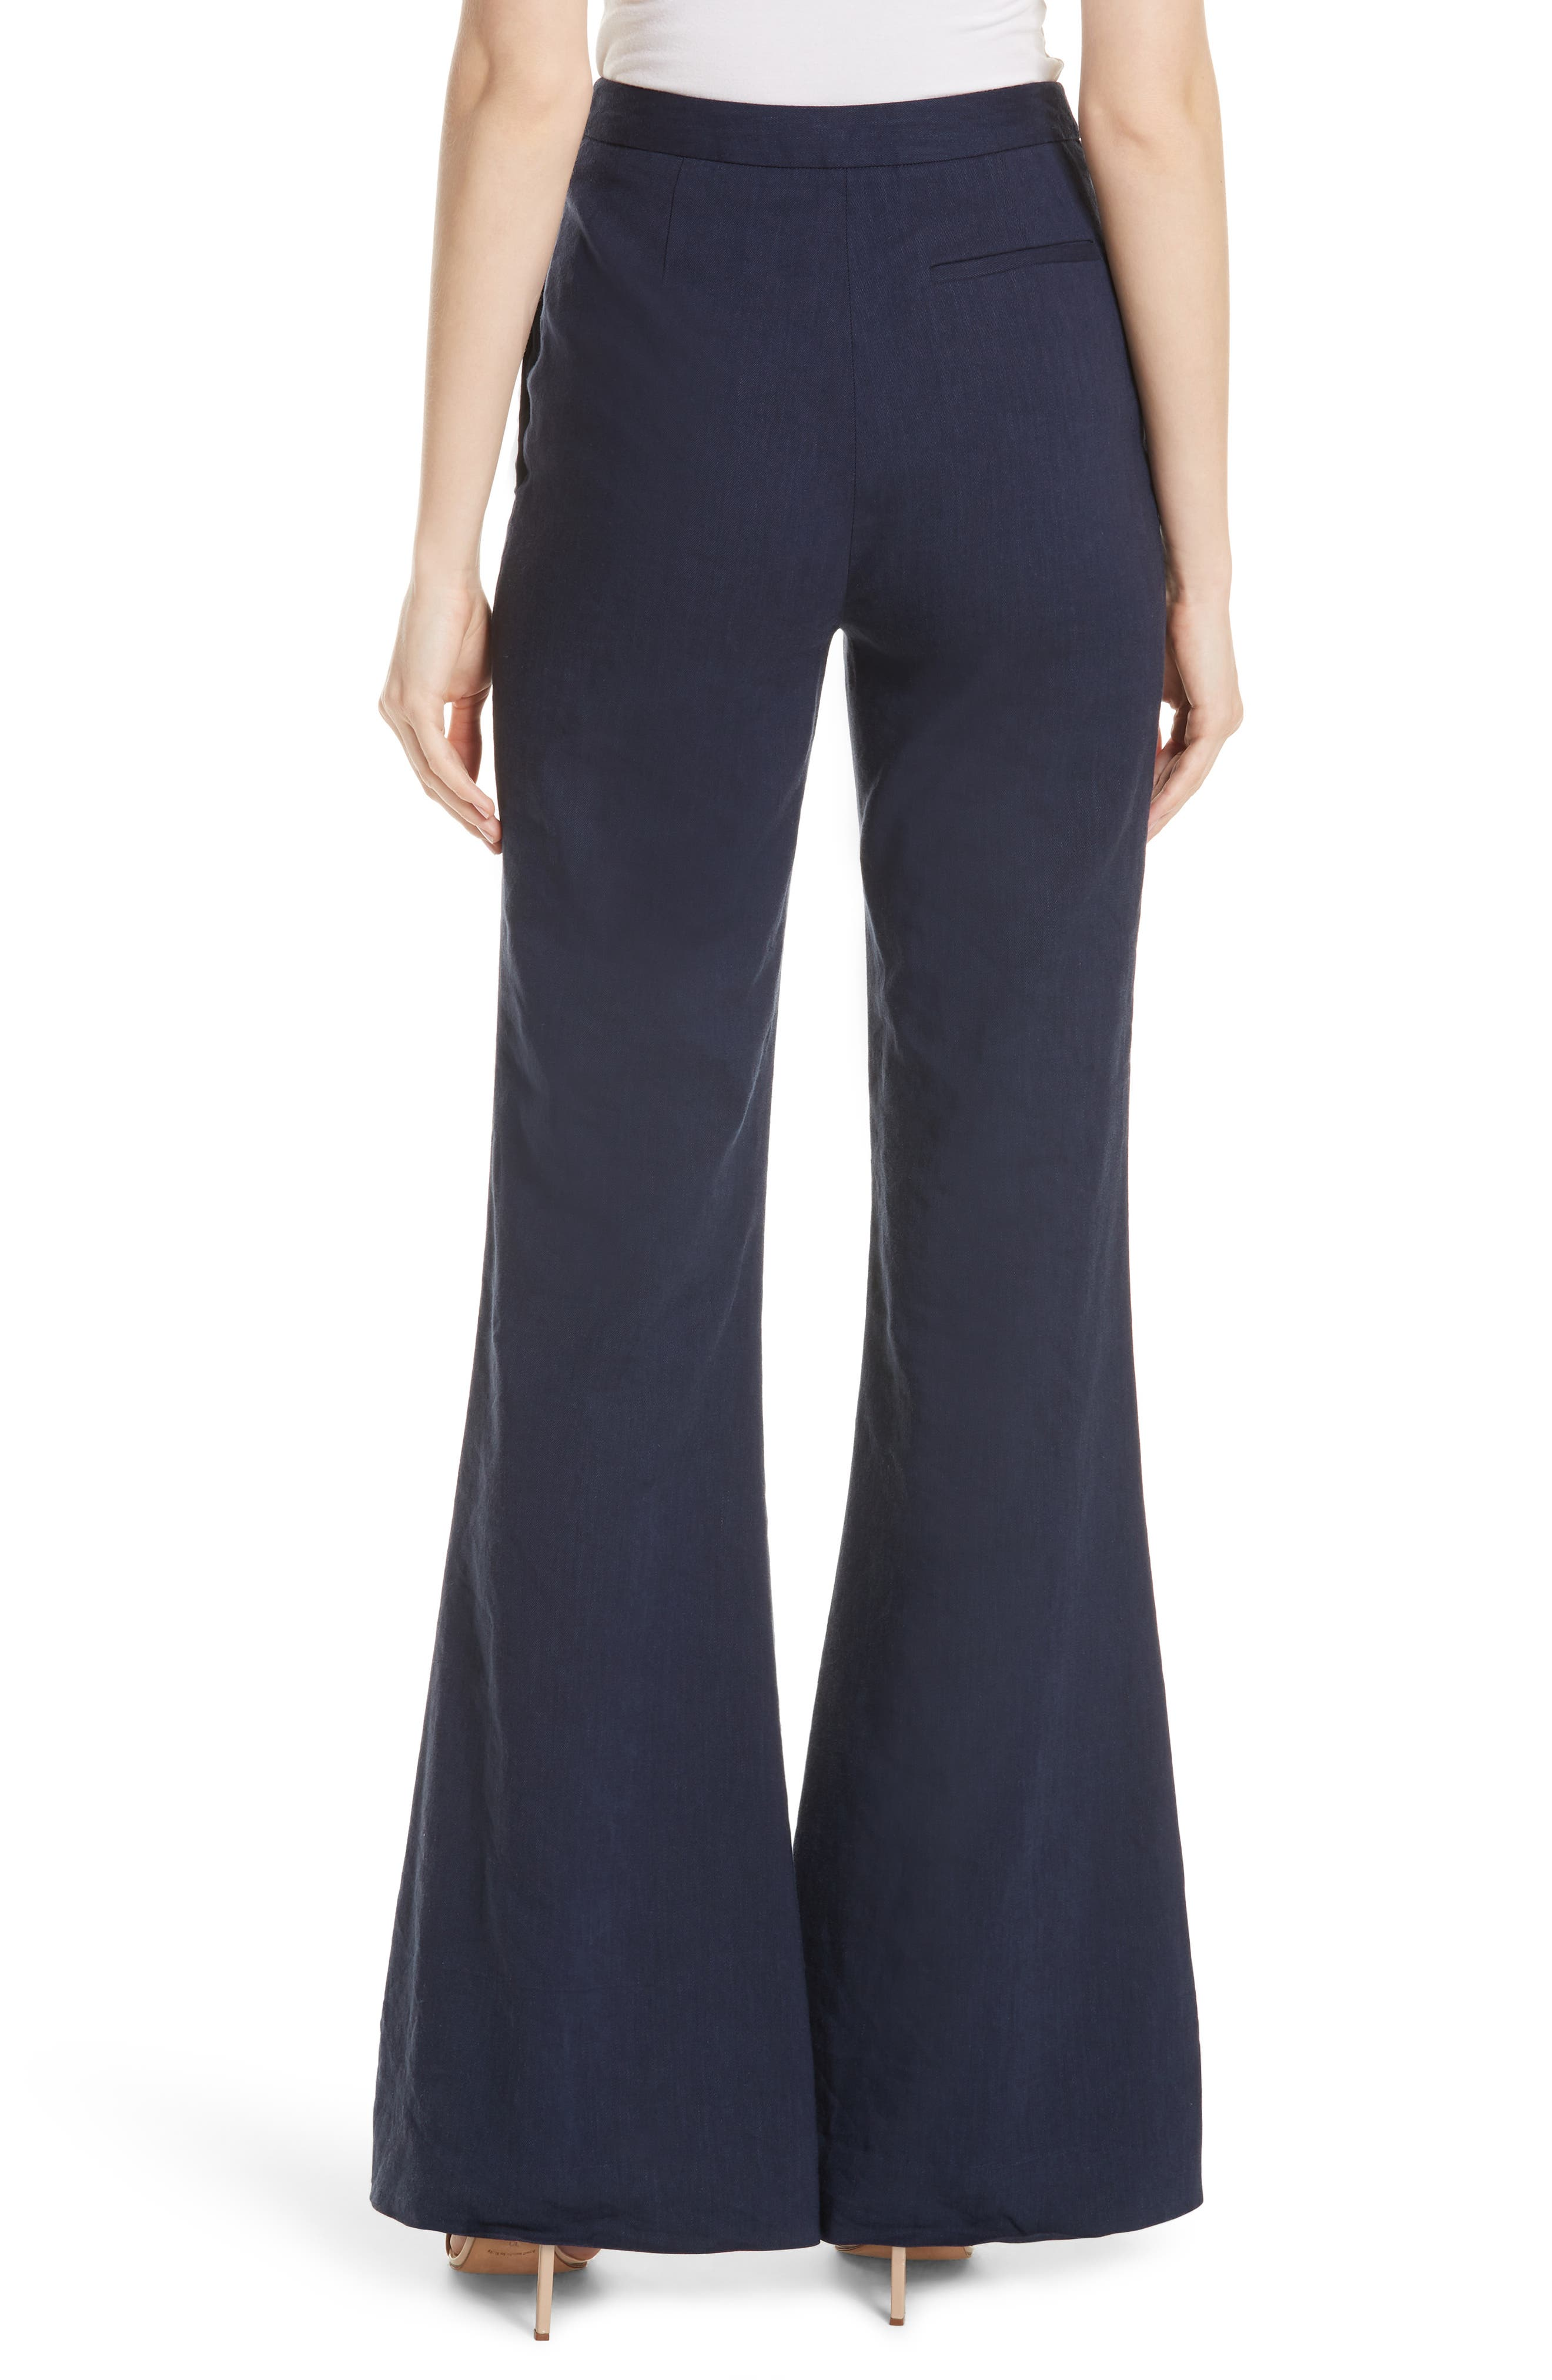 Diane von Furstenberg Pleat Front Flare Stretch Linen Blend Pants,                             Alternate thumbnail 2, color,                             New Navy